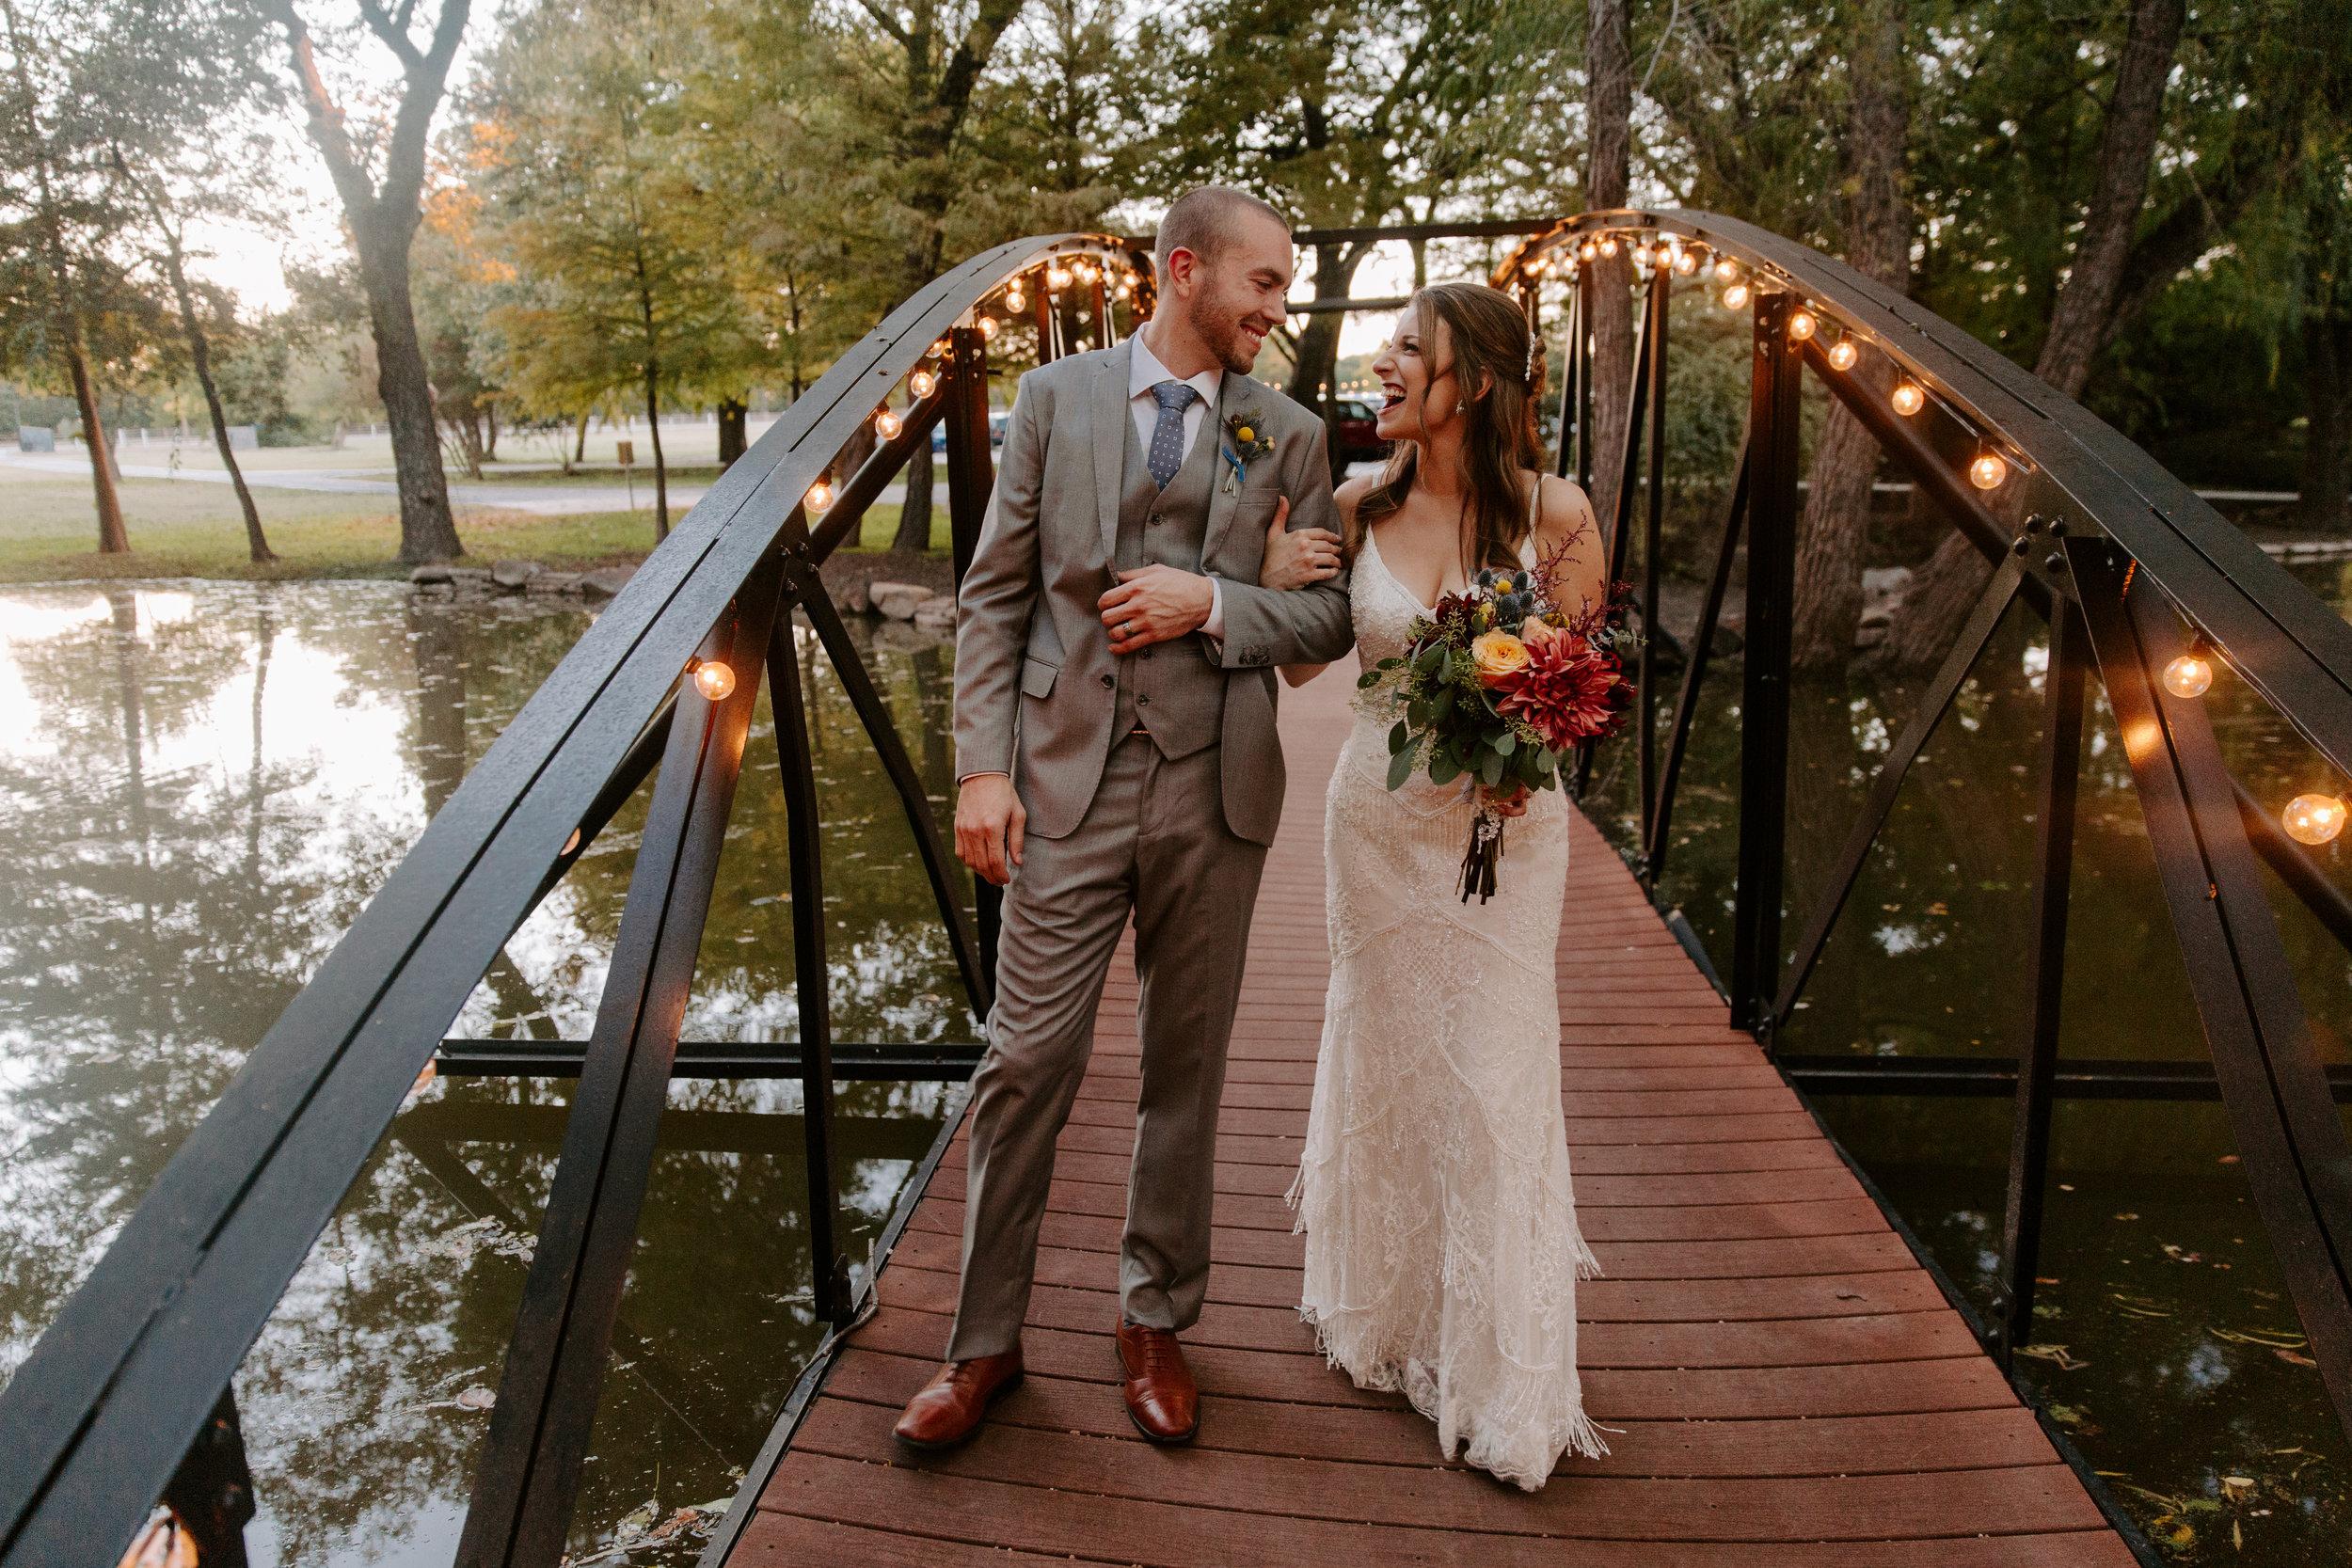 Worley Wedding - Arden and Eric - Wedding Photos - Sneak Peek -Meme Urbane Photography_-19.jpg